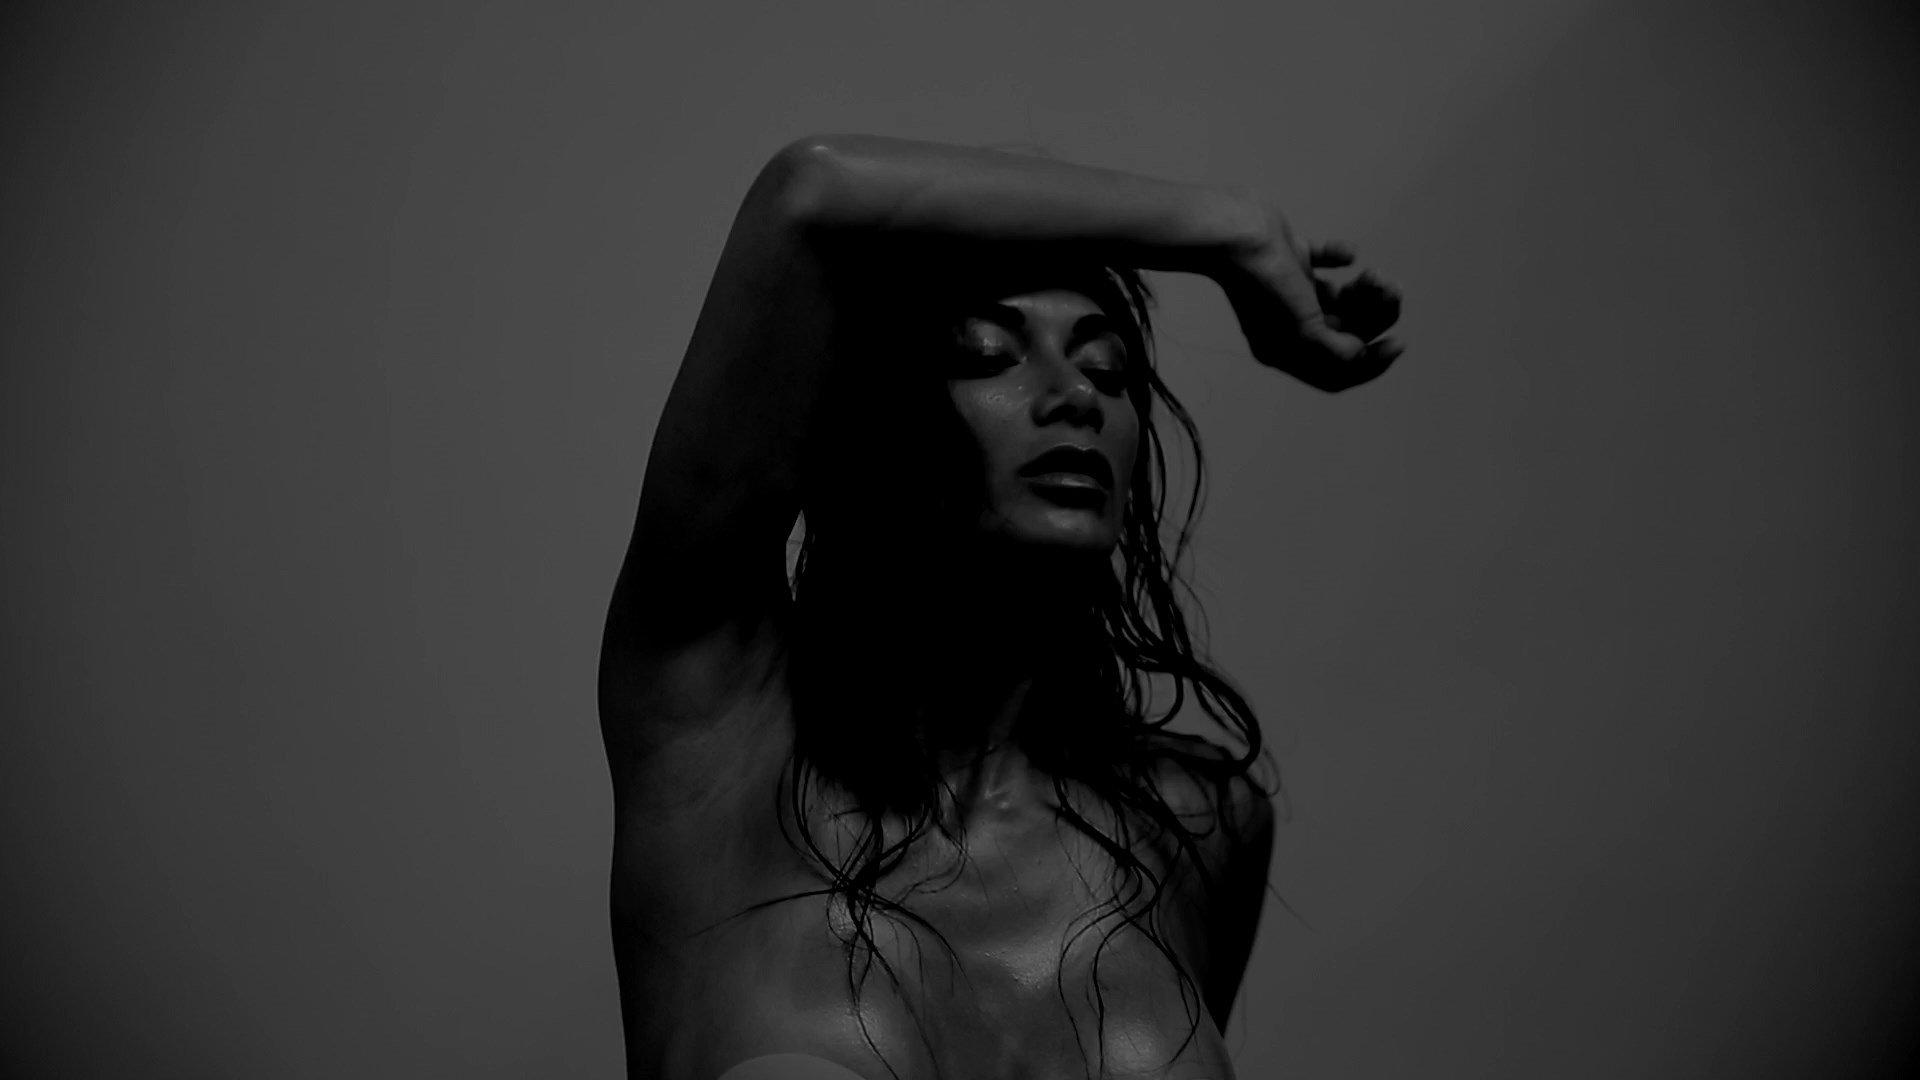 Nicole scherzinger shakes her flipping heck booty in a bikini for million plus instagram views